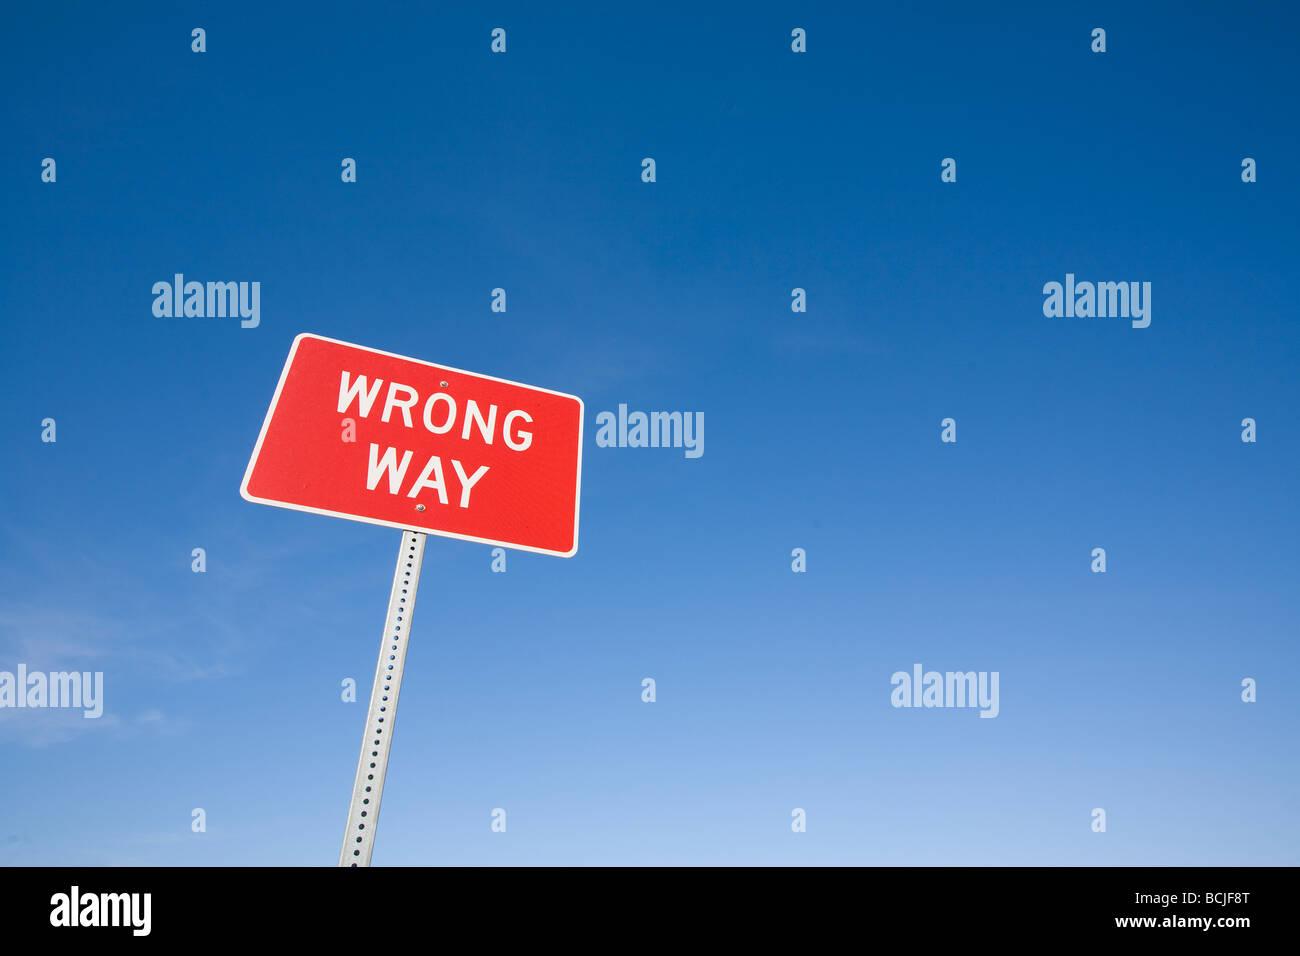 Rot weiß WRONG WAY Autobahn Warnschild gegen blauen Himmel Stockbild